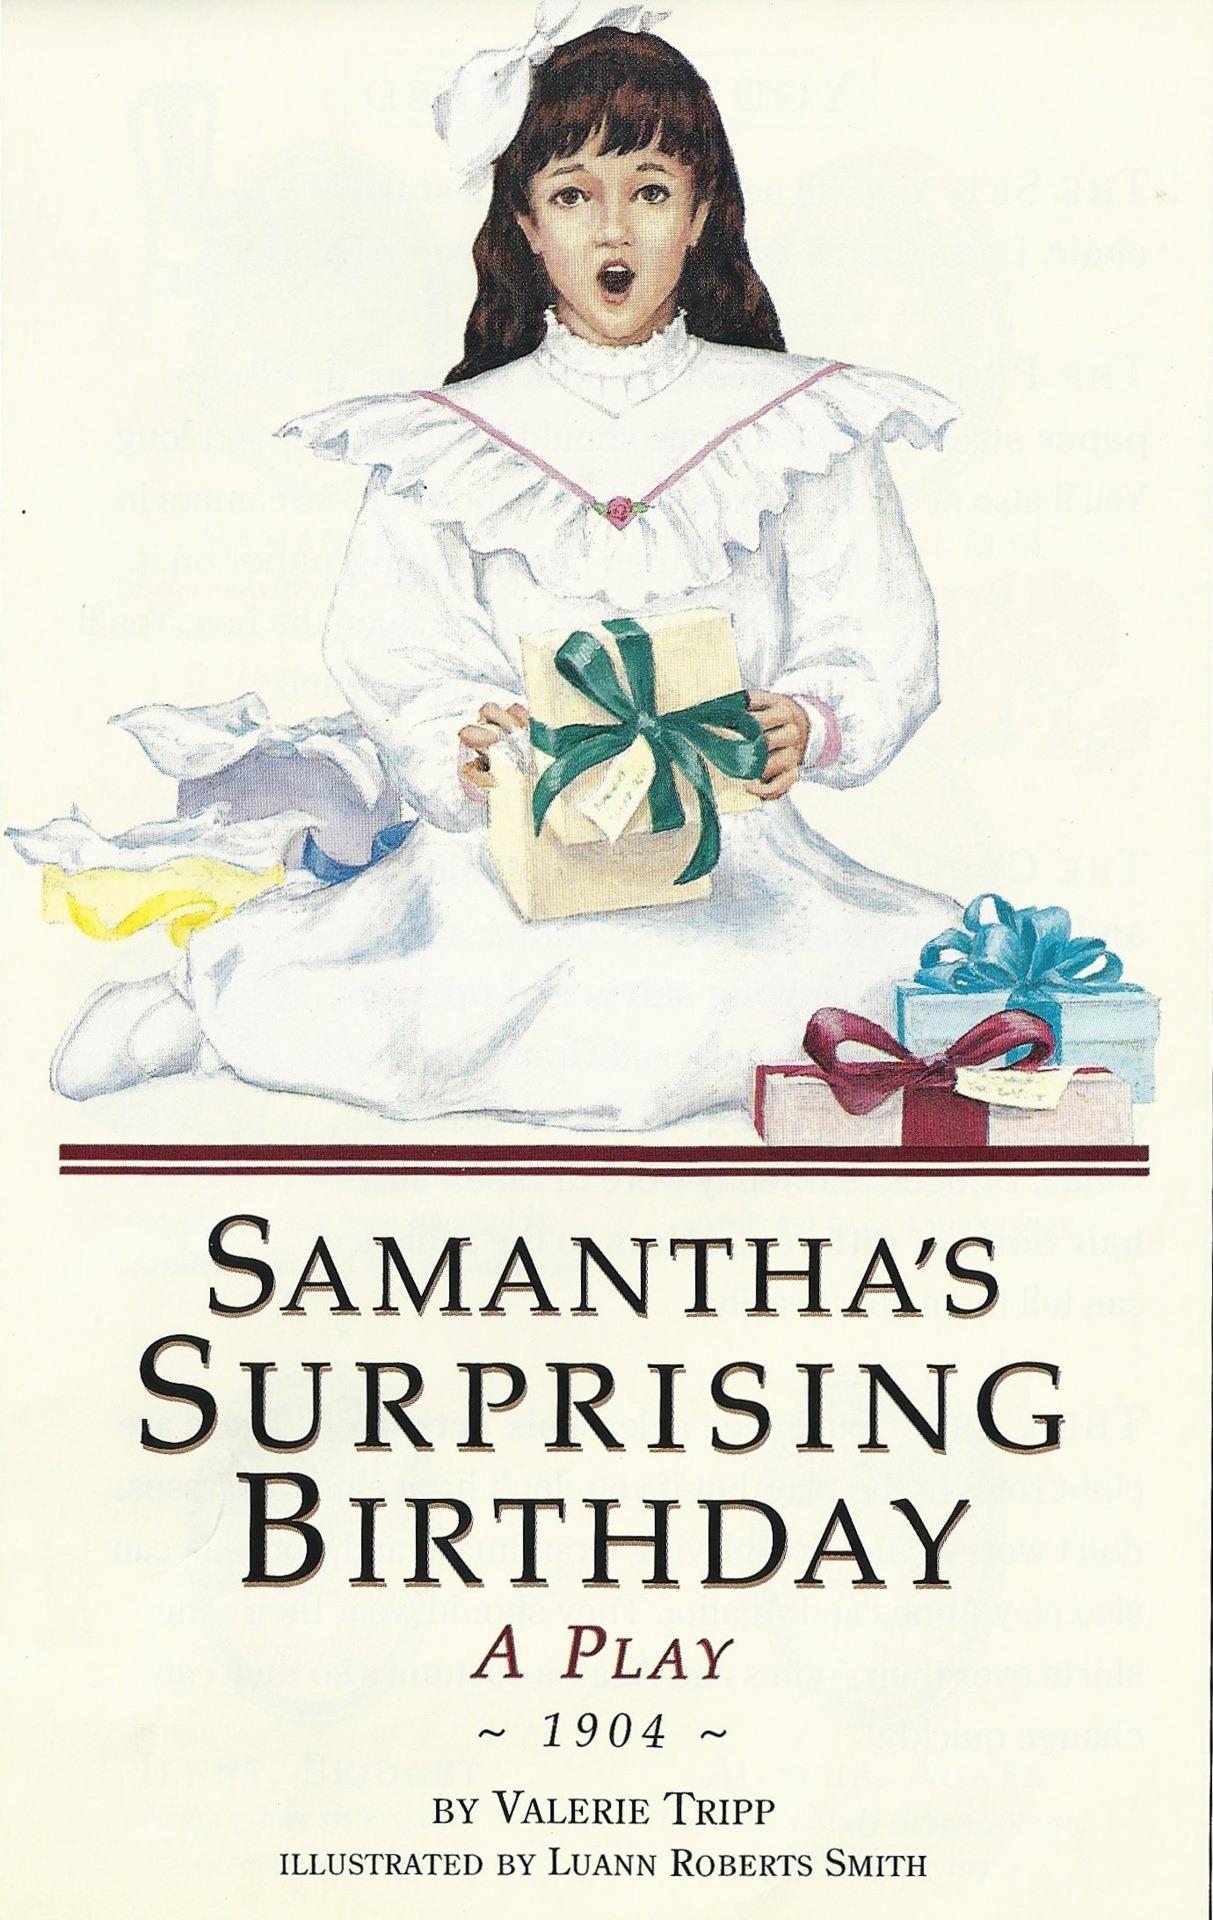 Samantha's Surprising Birthday